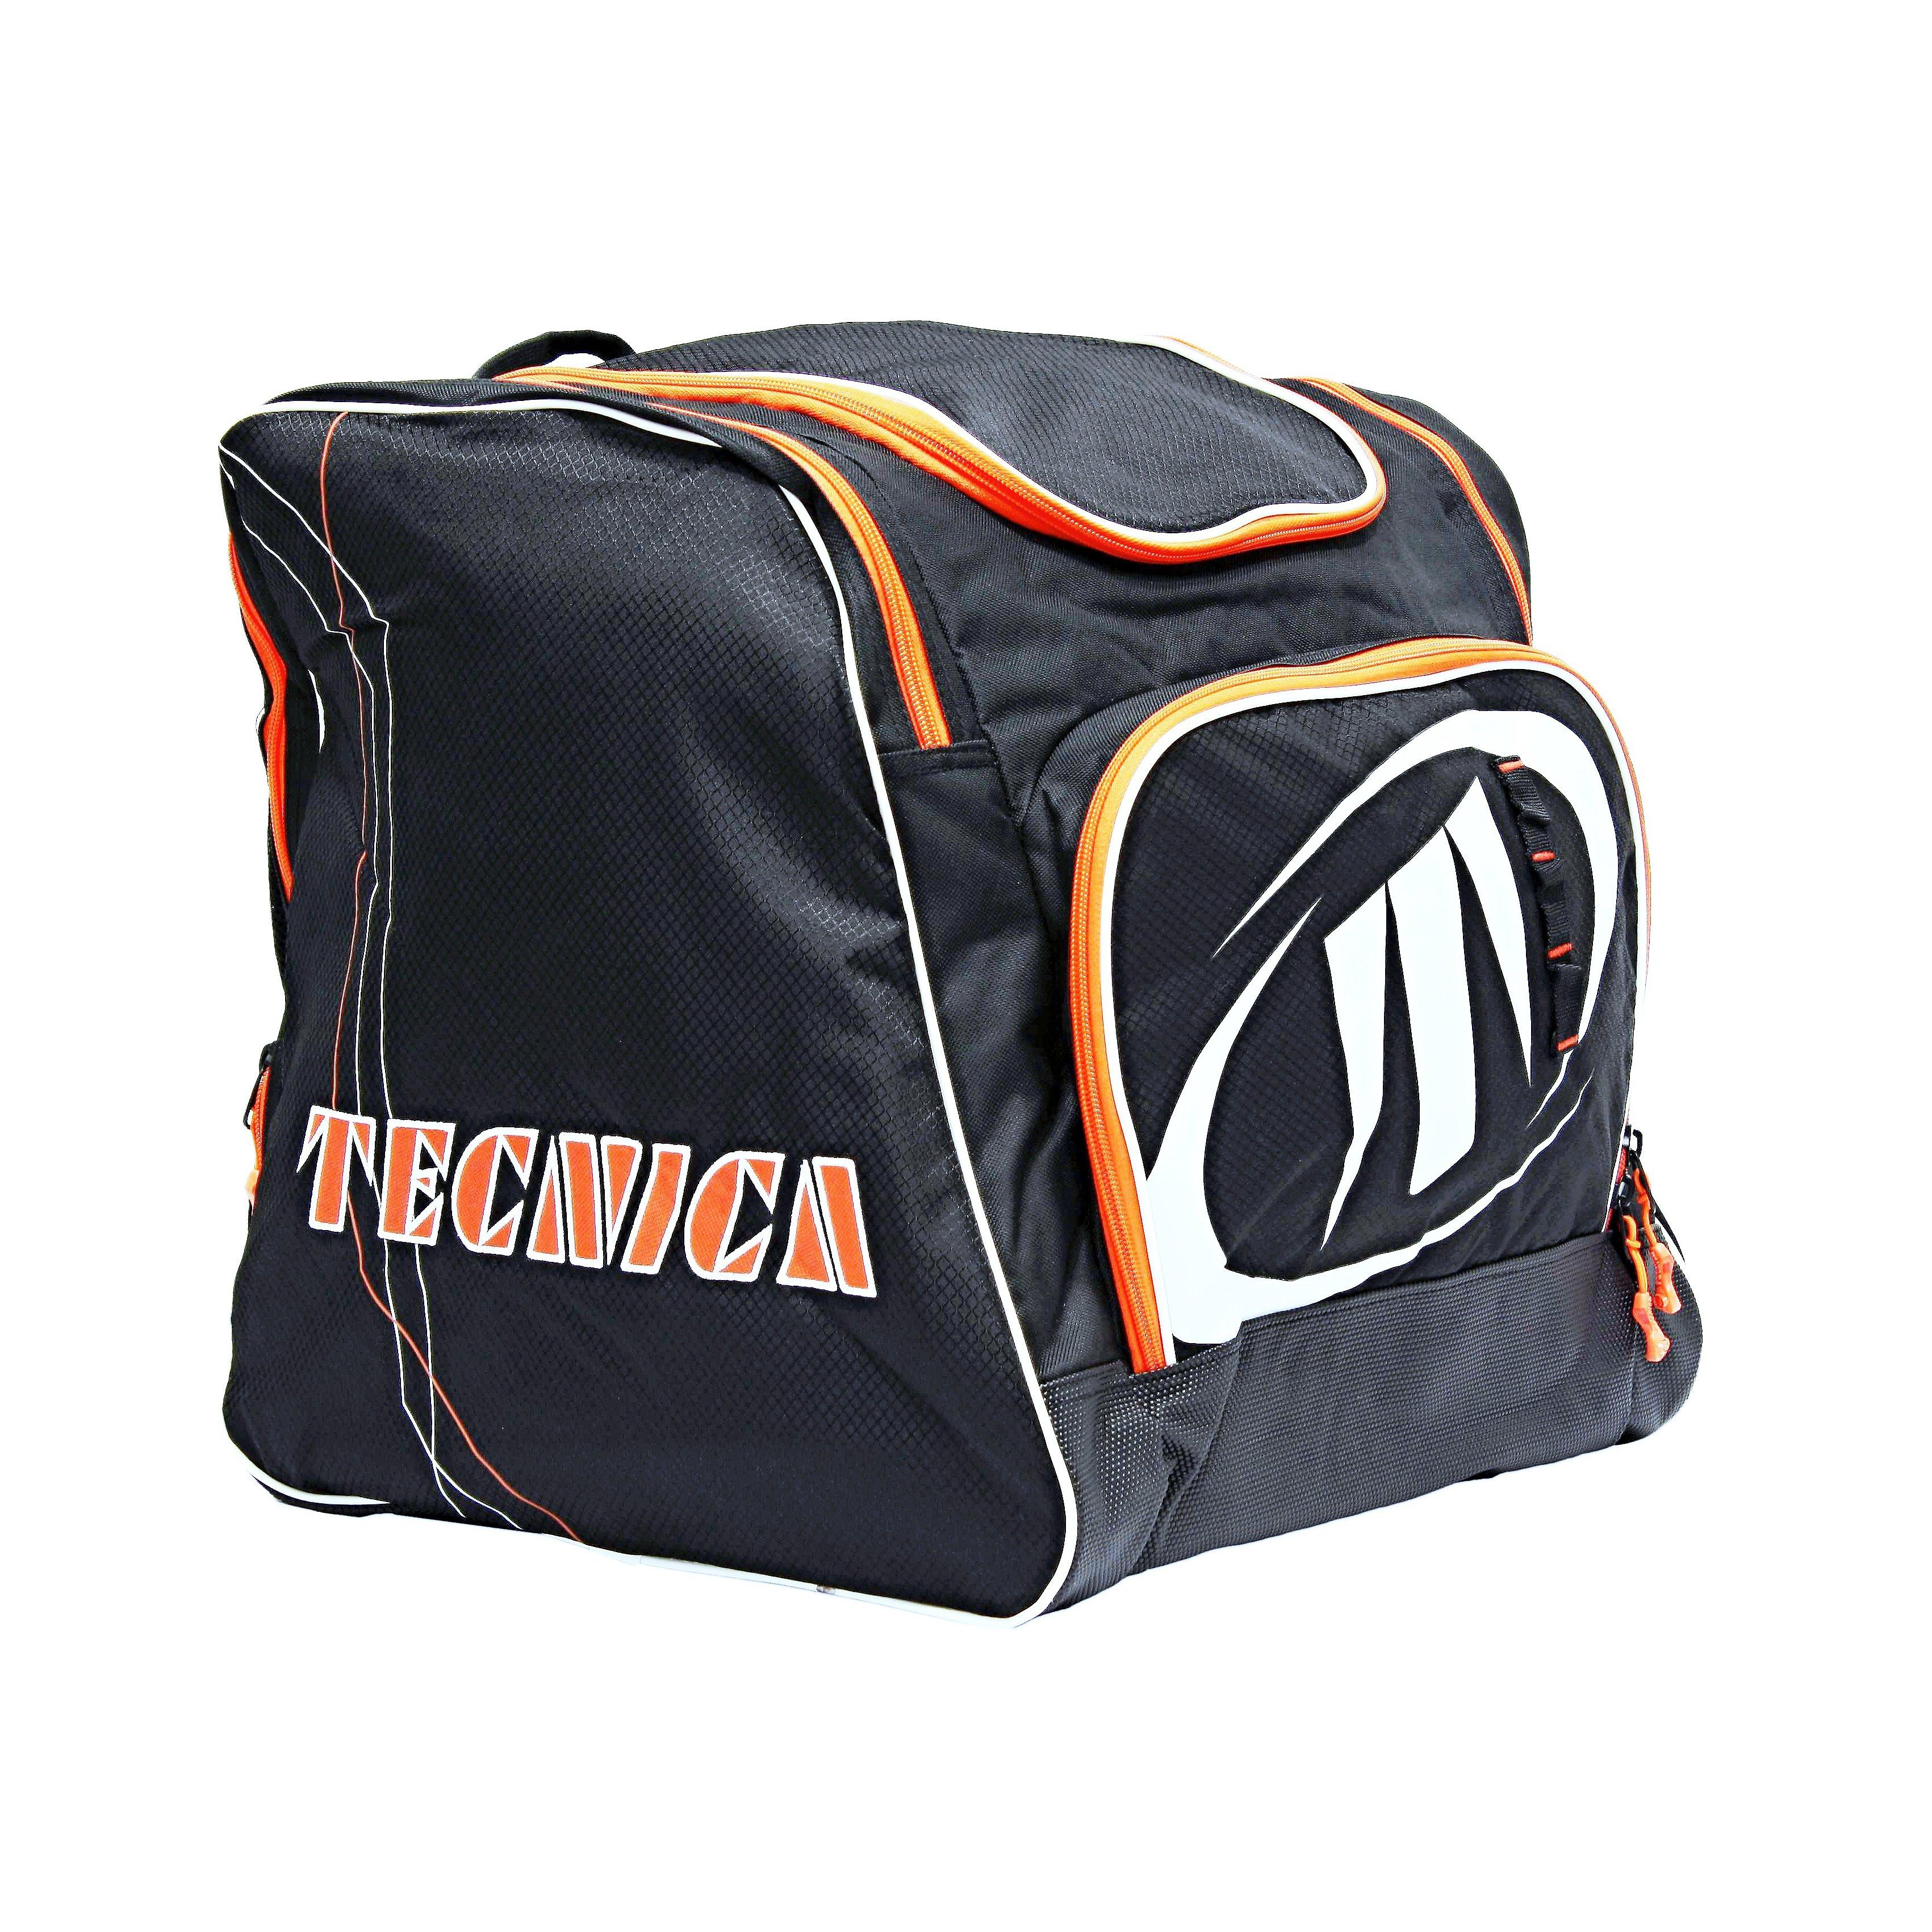 Tecnica Family / Team Skiboot Bagpack Black Orange